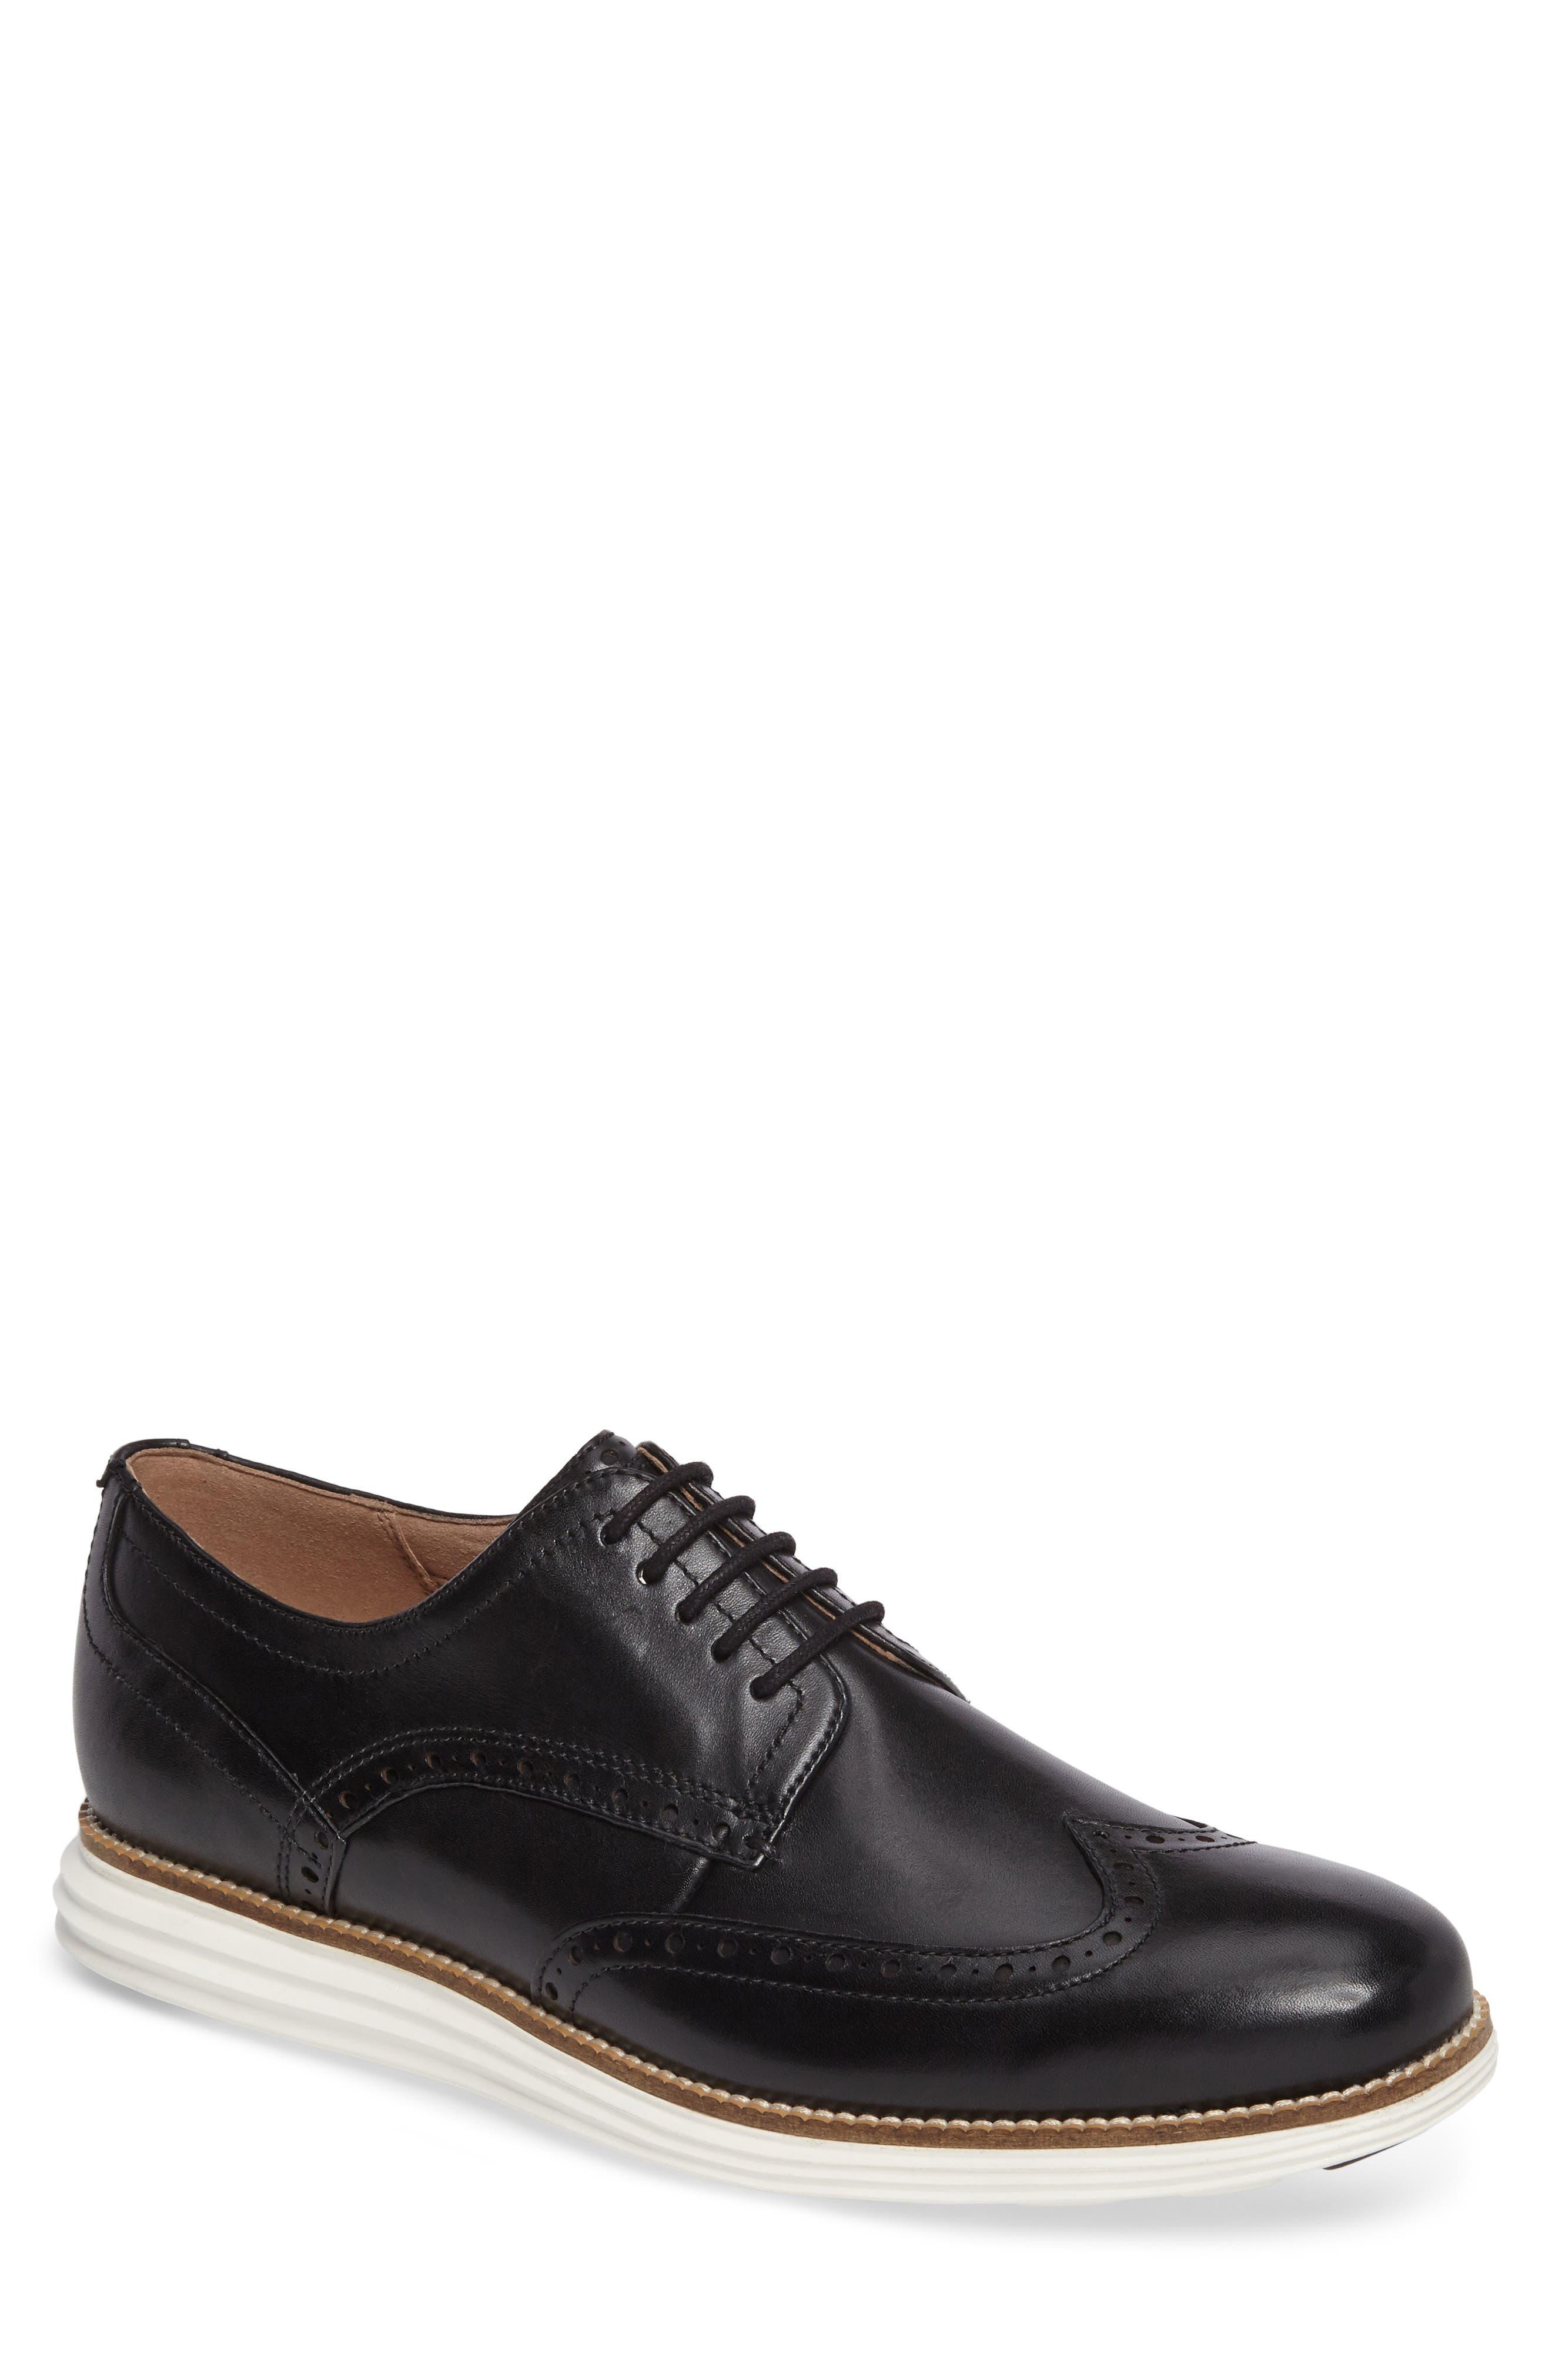 Men'S Original Grand Leather Wing-Tip Oxfords, Black in Black/White